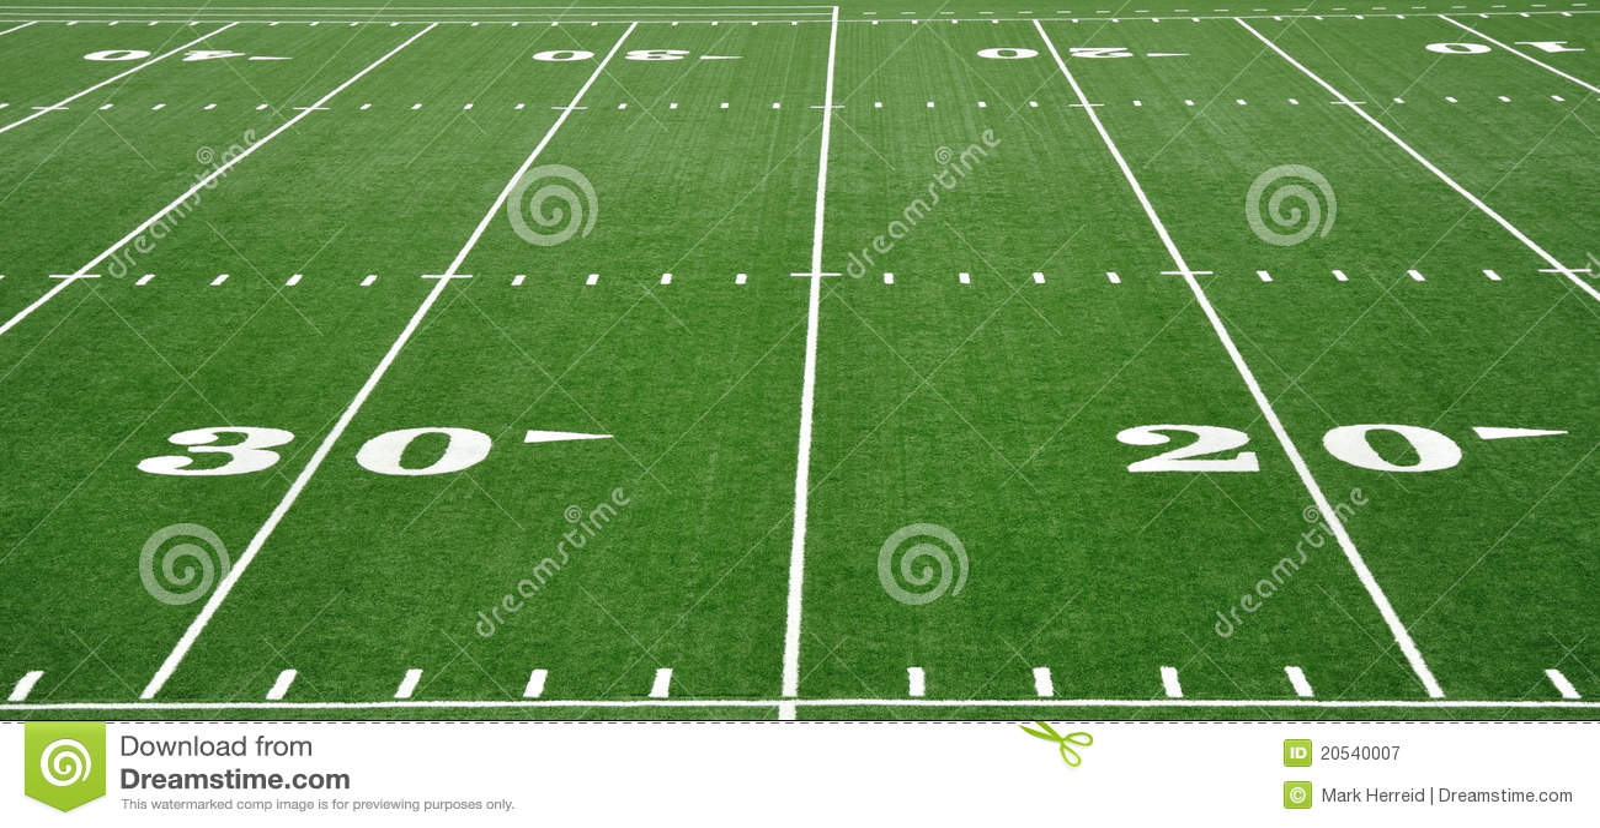 20 & 30 Yard Line on American Football Field